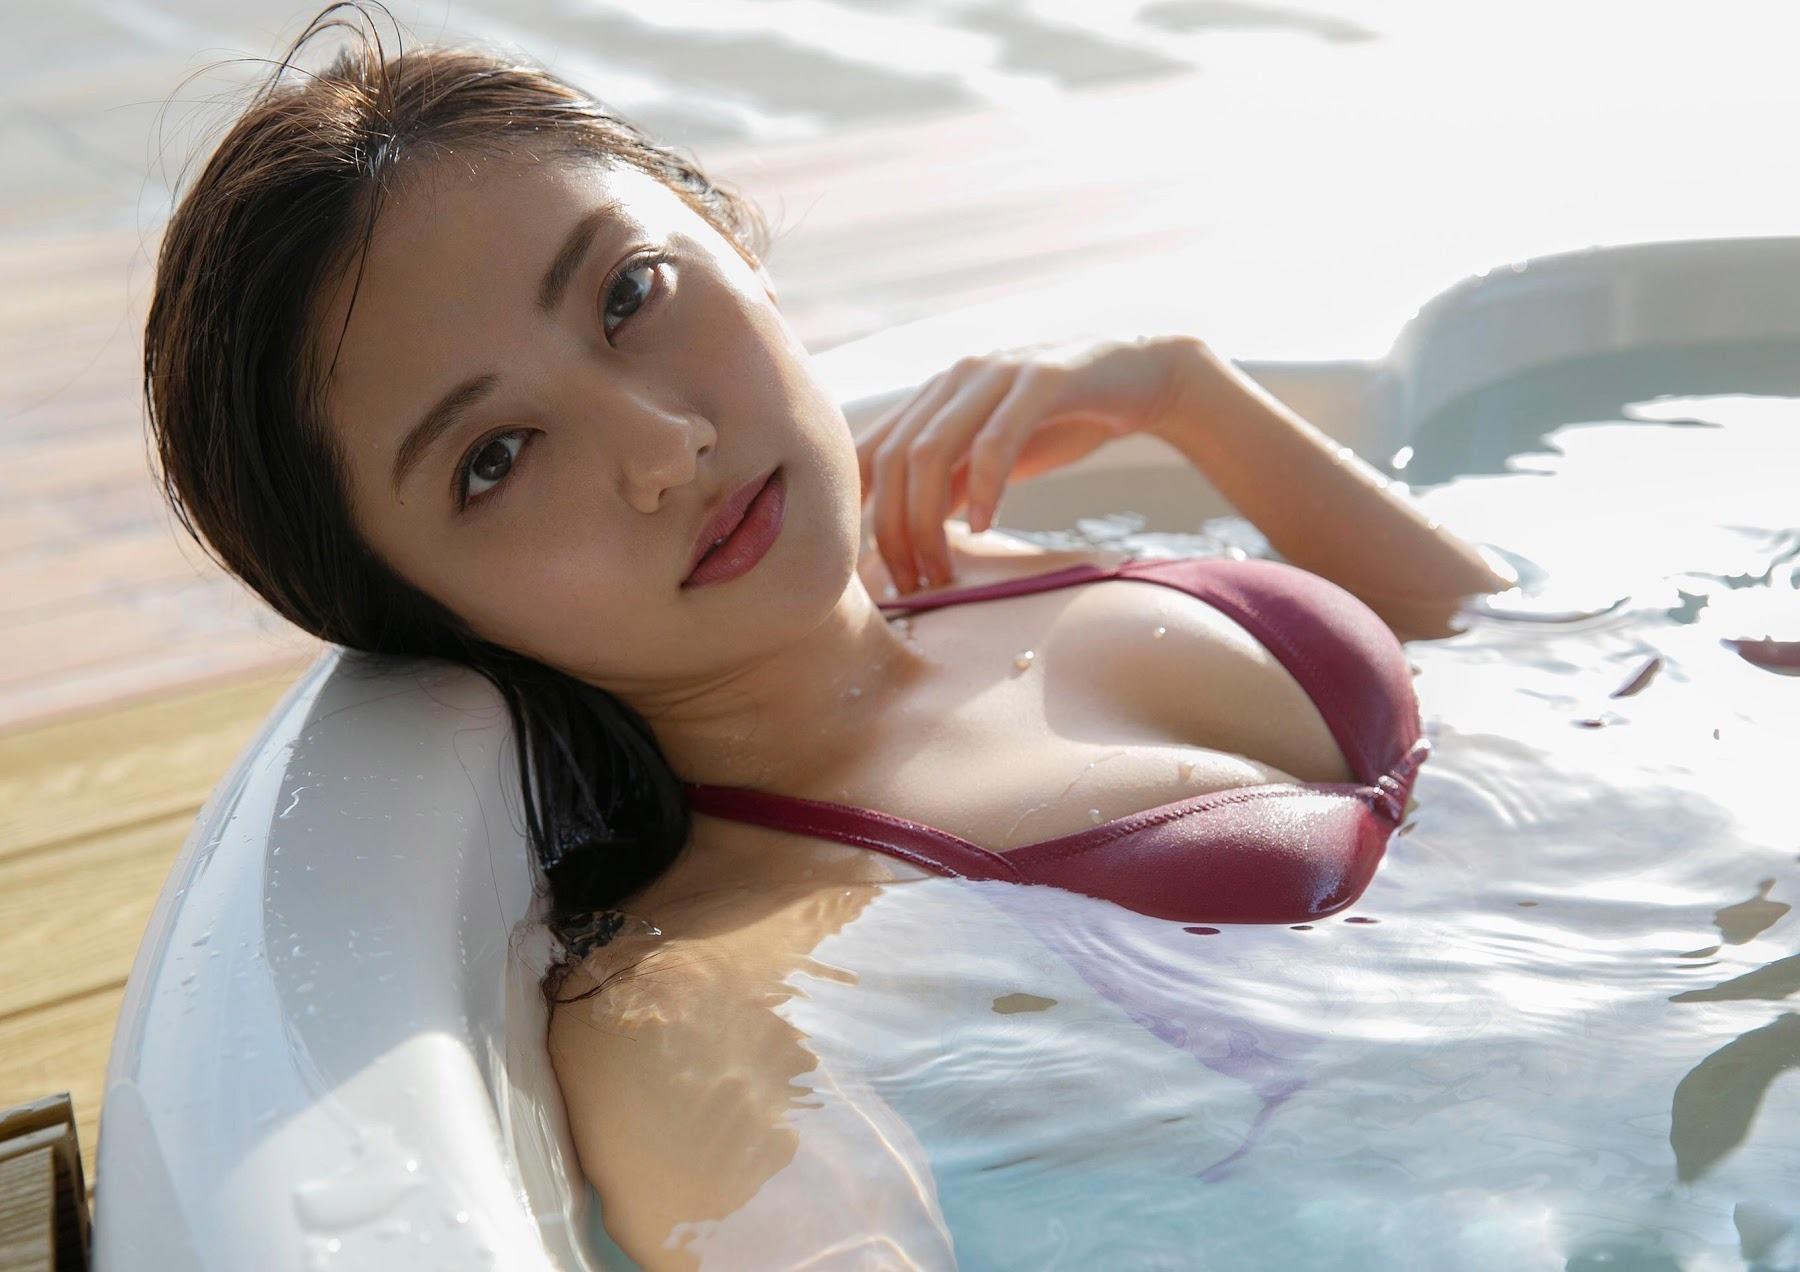 「日本最美身體」奧山かずさ 白嫩渾圓火辣大放送 - 亞洲美女 -